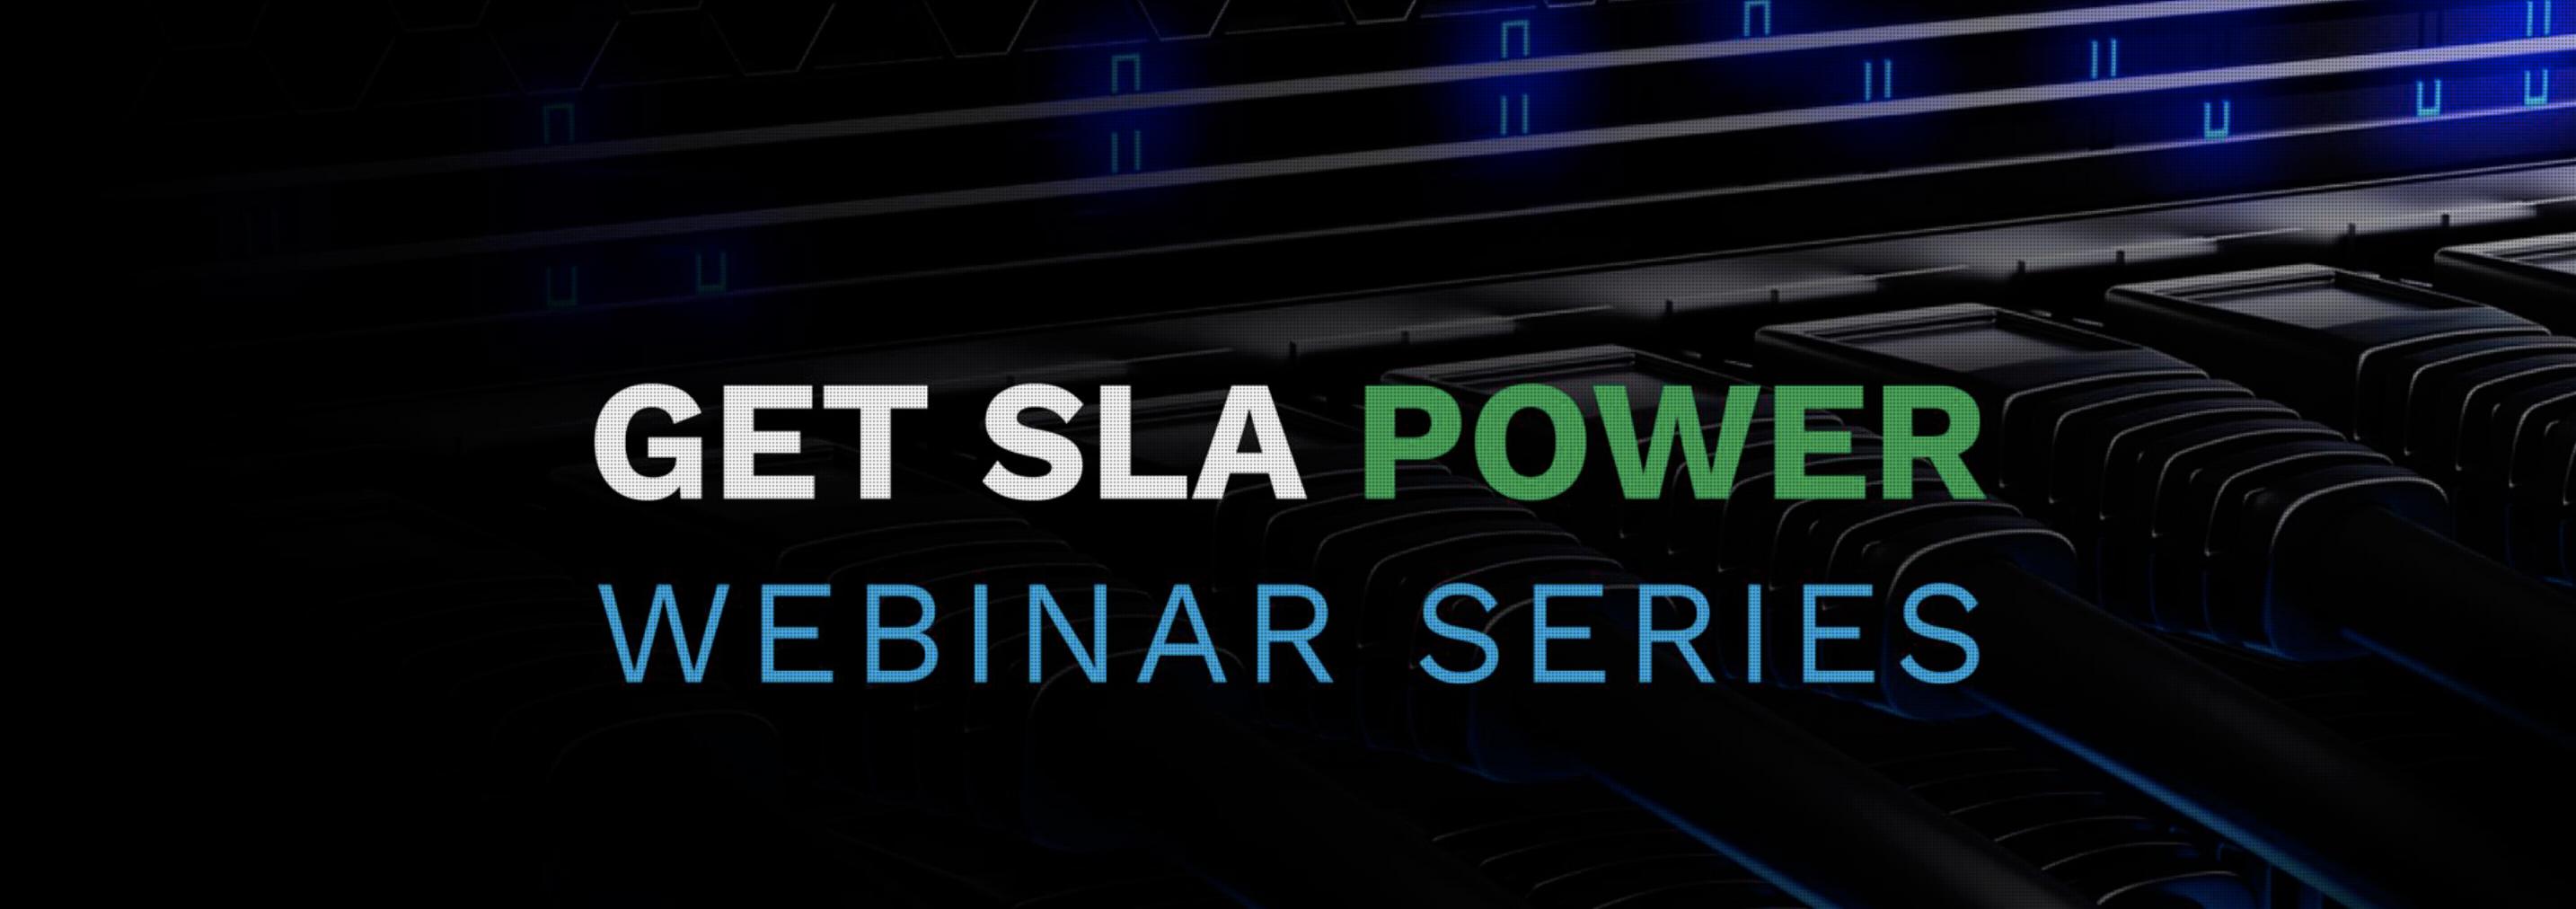 Webinar Series: Get Your SLA Power Back!